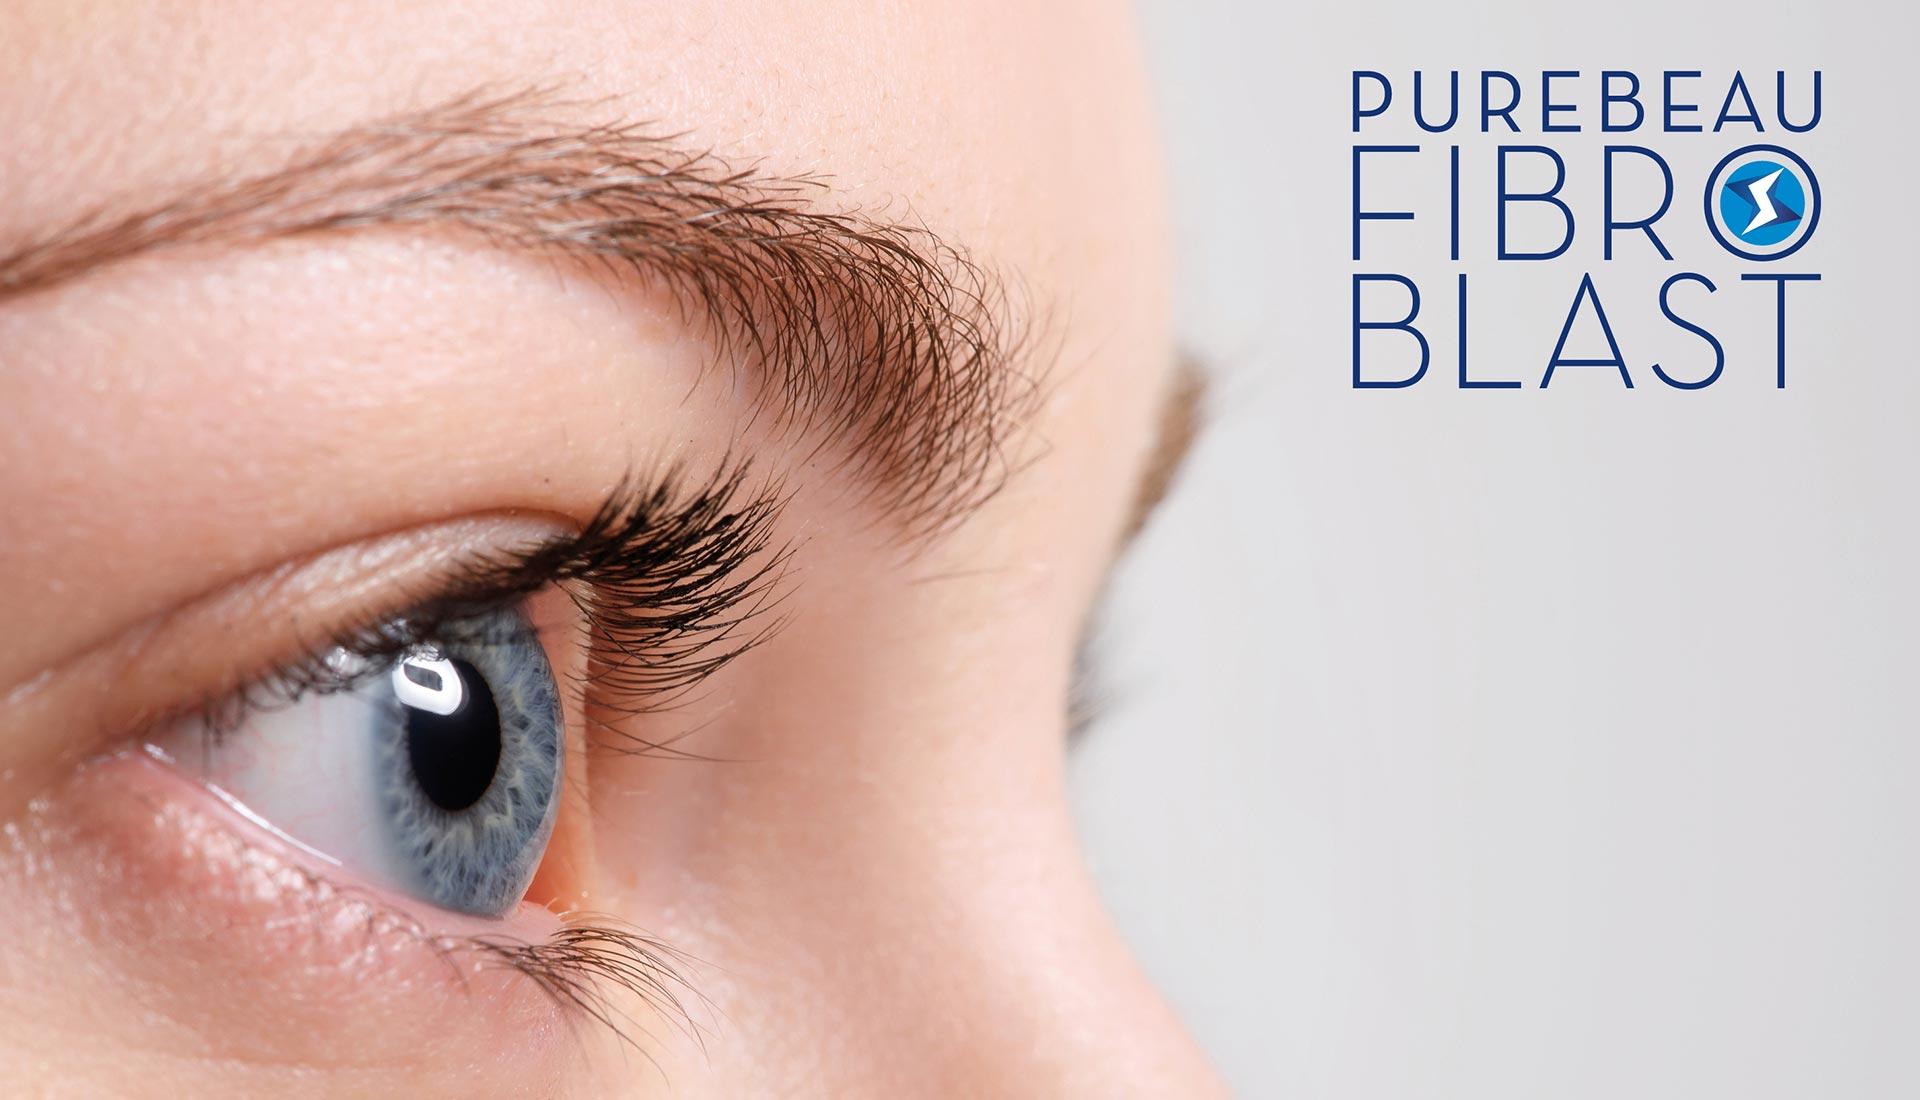 kosmetikstudio-charisma-slider-startseite-fibroblast